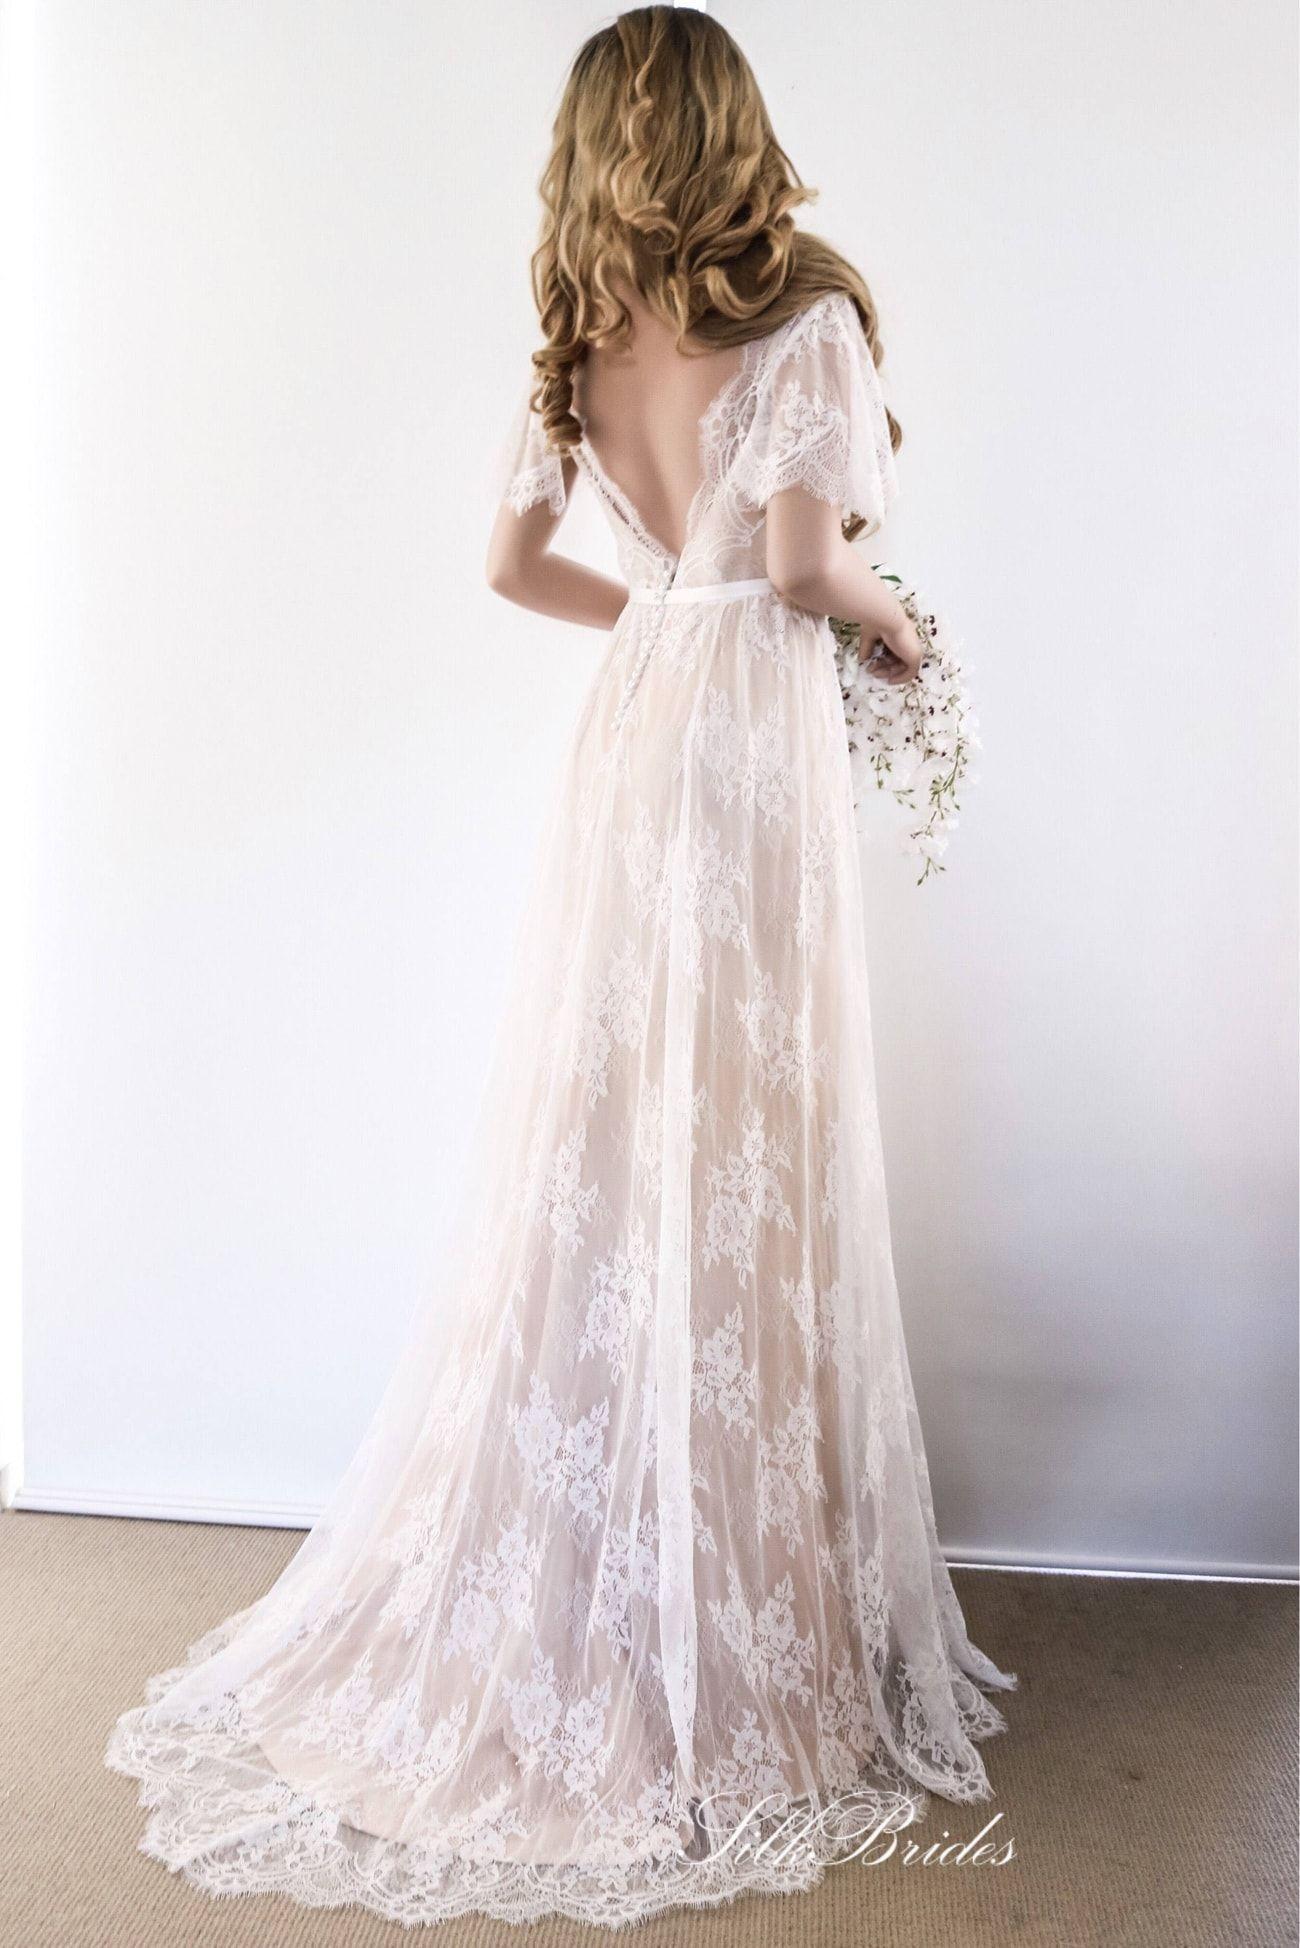 Sheer wedding dress   Chic u Sheer Wedding Dresses from Etsy  SouthBound Bride